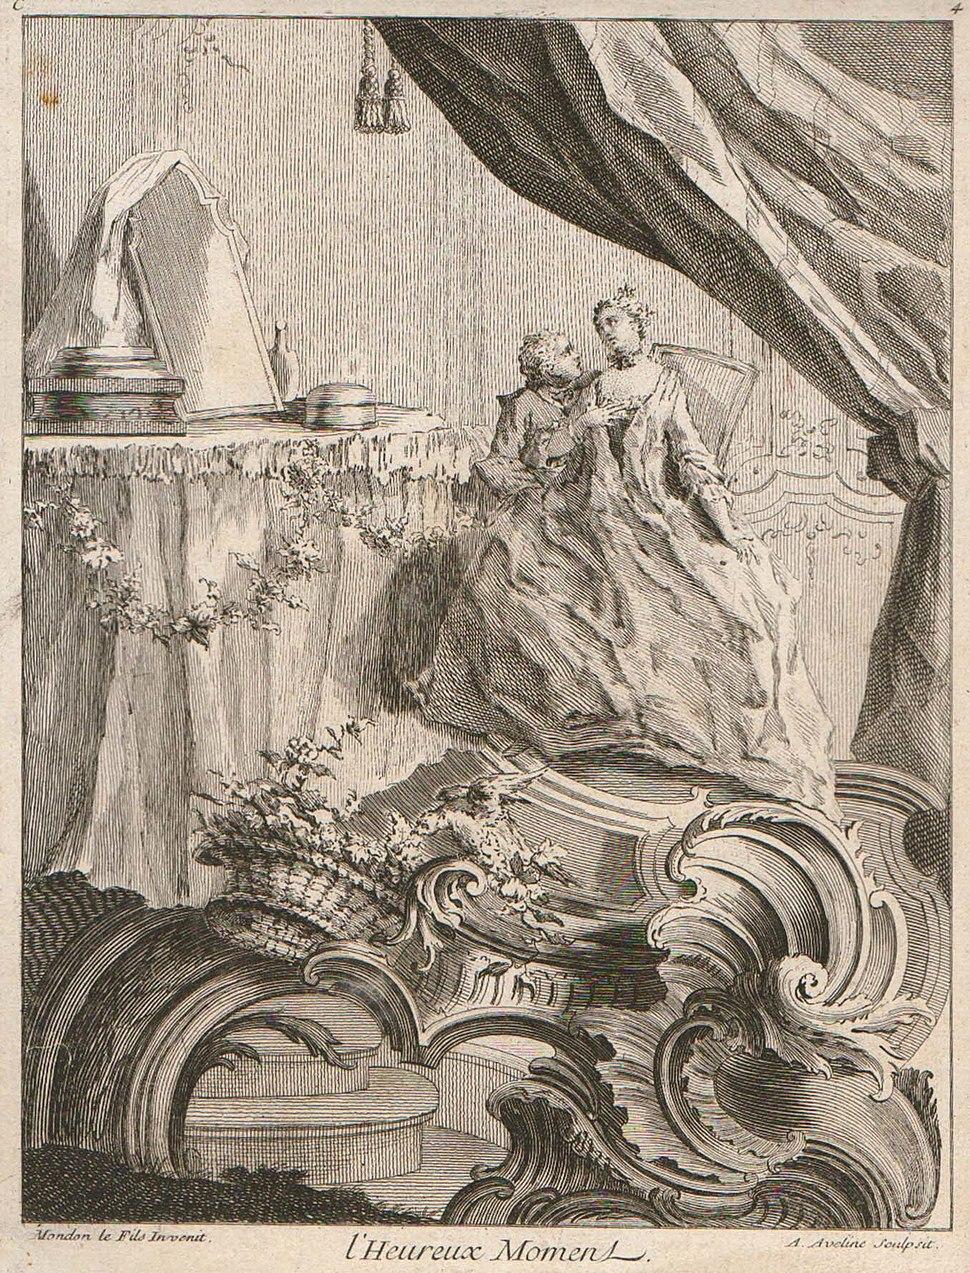 A. Avelin after Mondon le Fils